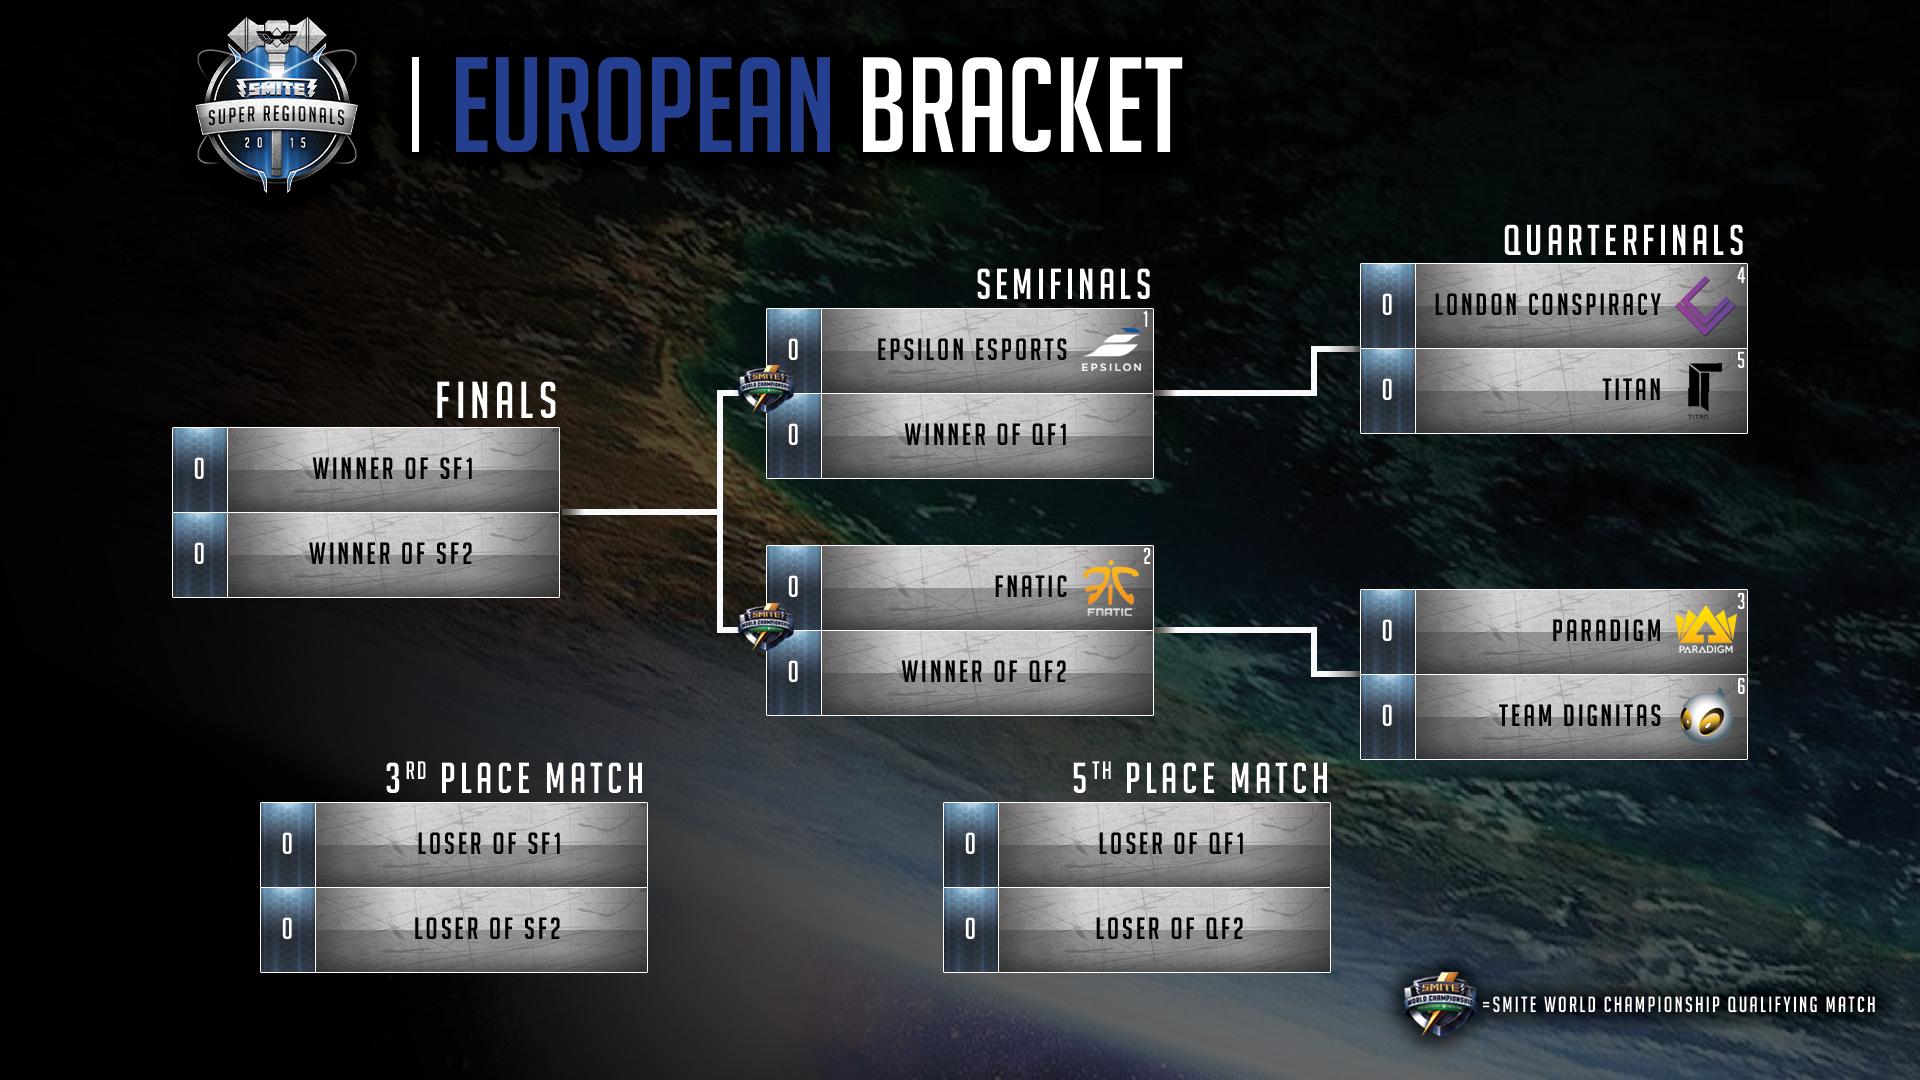 super-regionals-bracket_EU